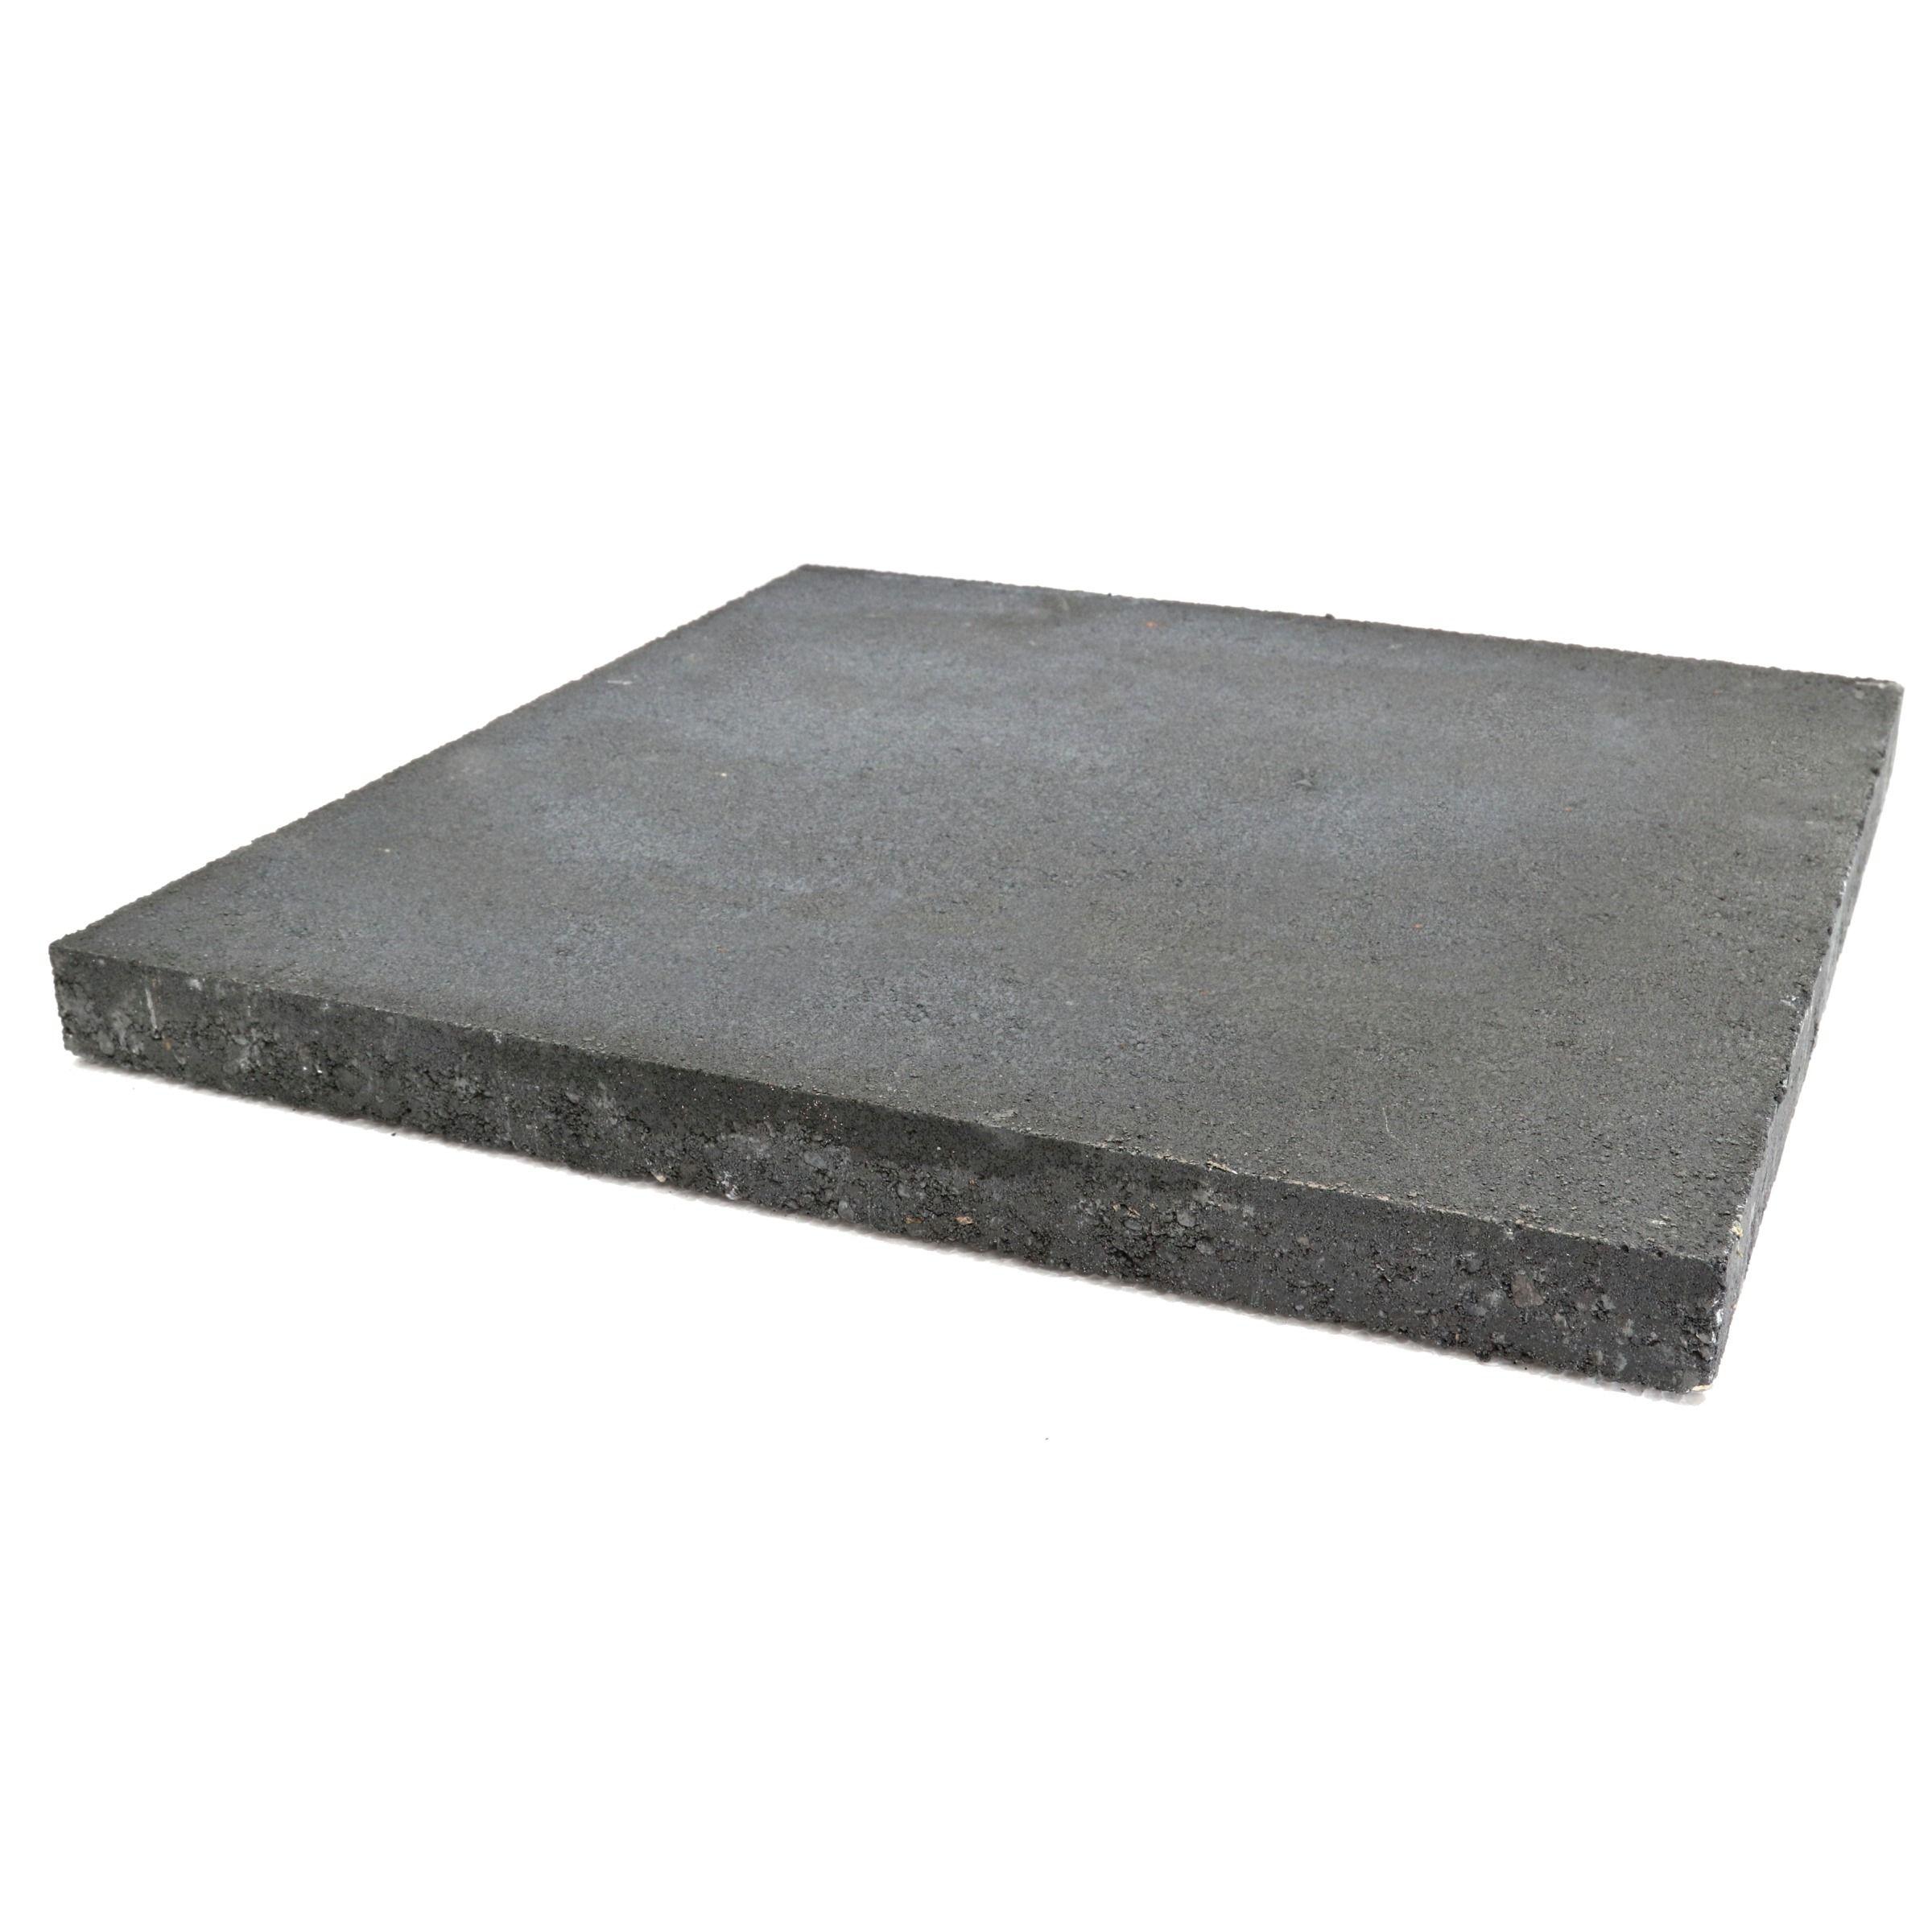 Drainage Tegels 50x50.Betontegel Antraciet 50x50 Cm Per Tegel 0 25 M2 In 2019